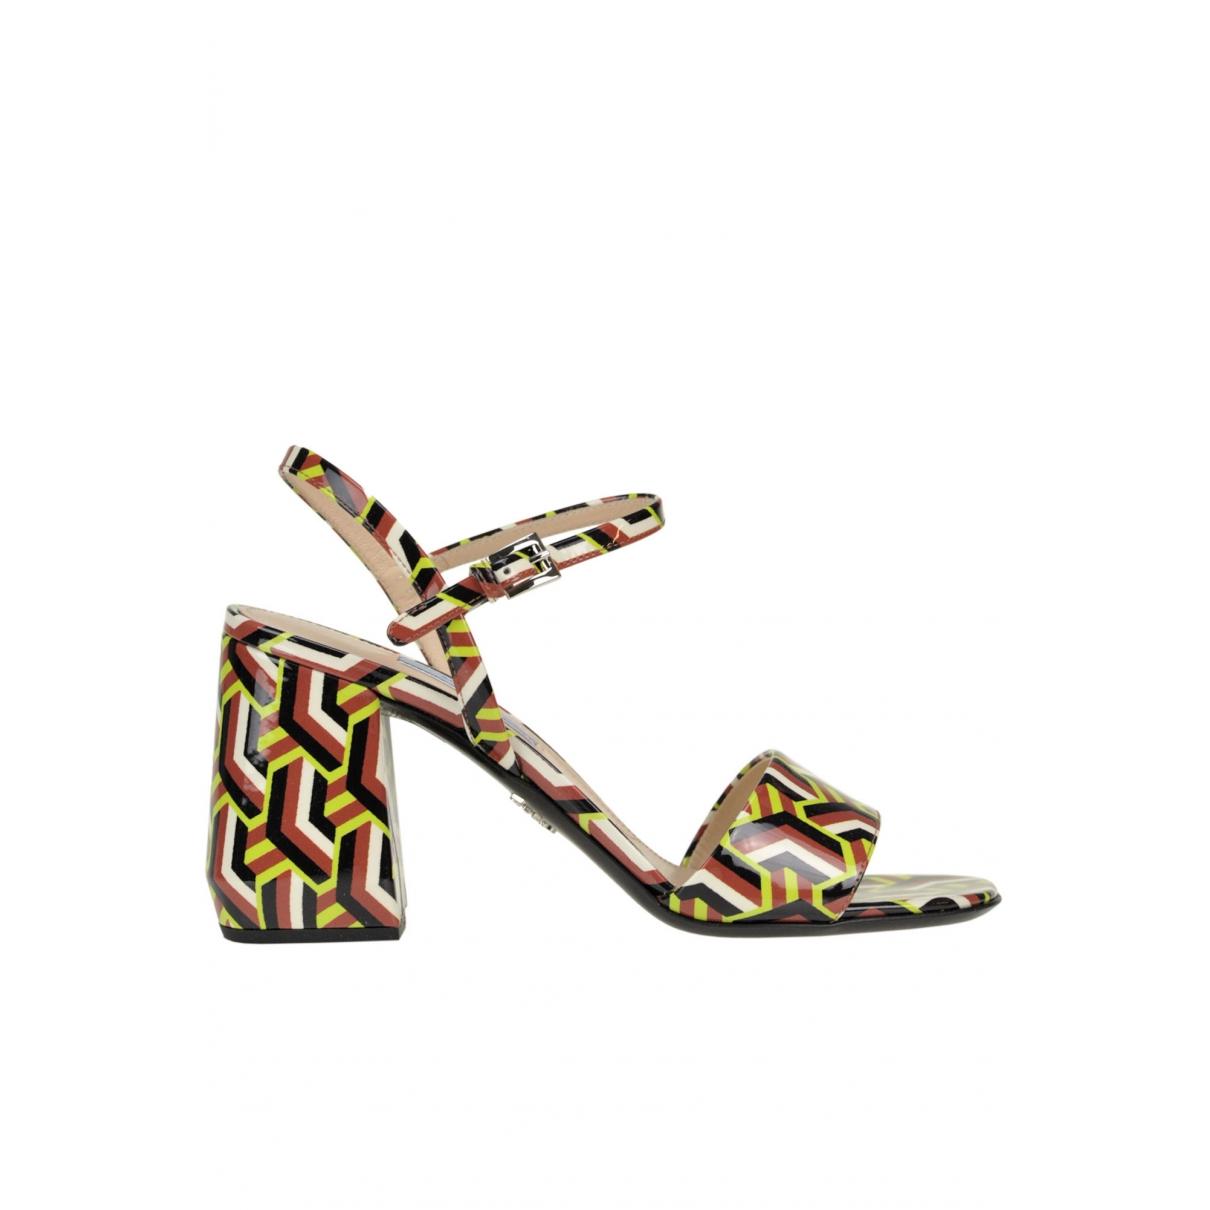 Prada \N Multicolour Patent leather Sandals for Women 37.5 EU